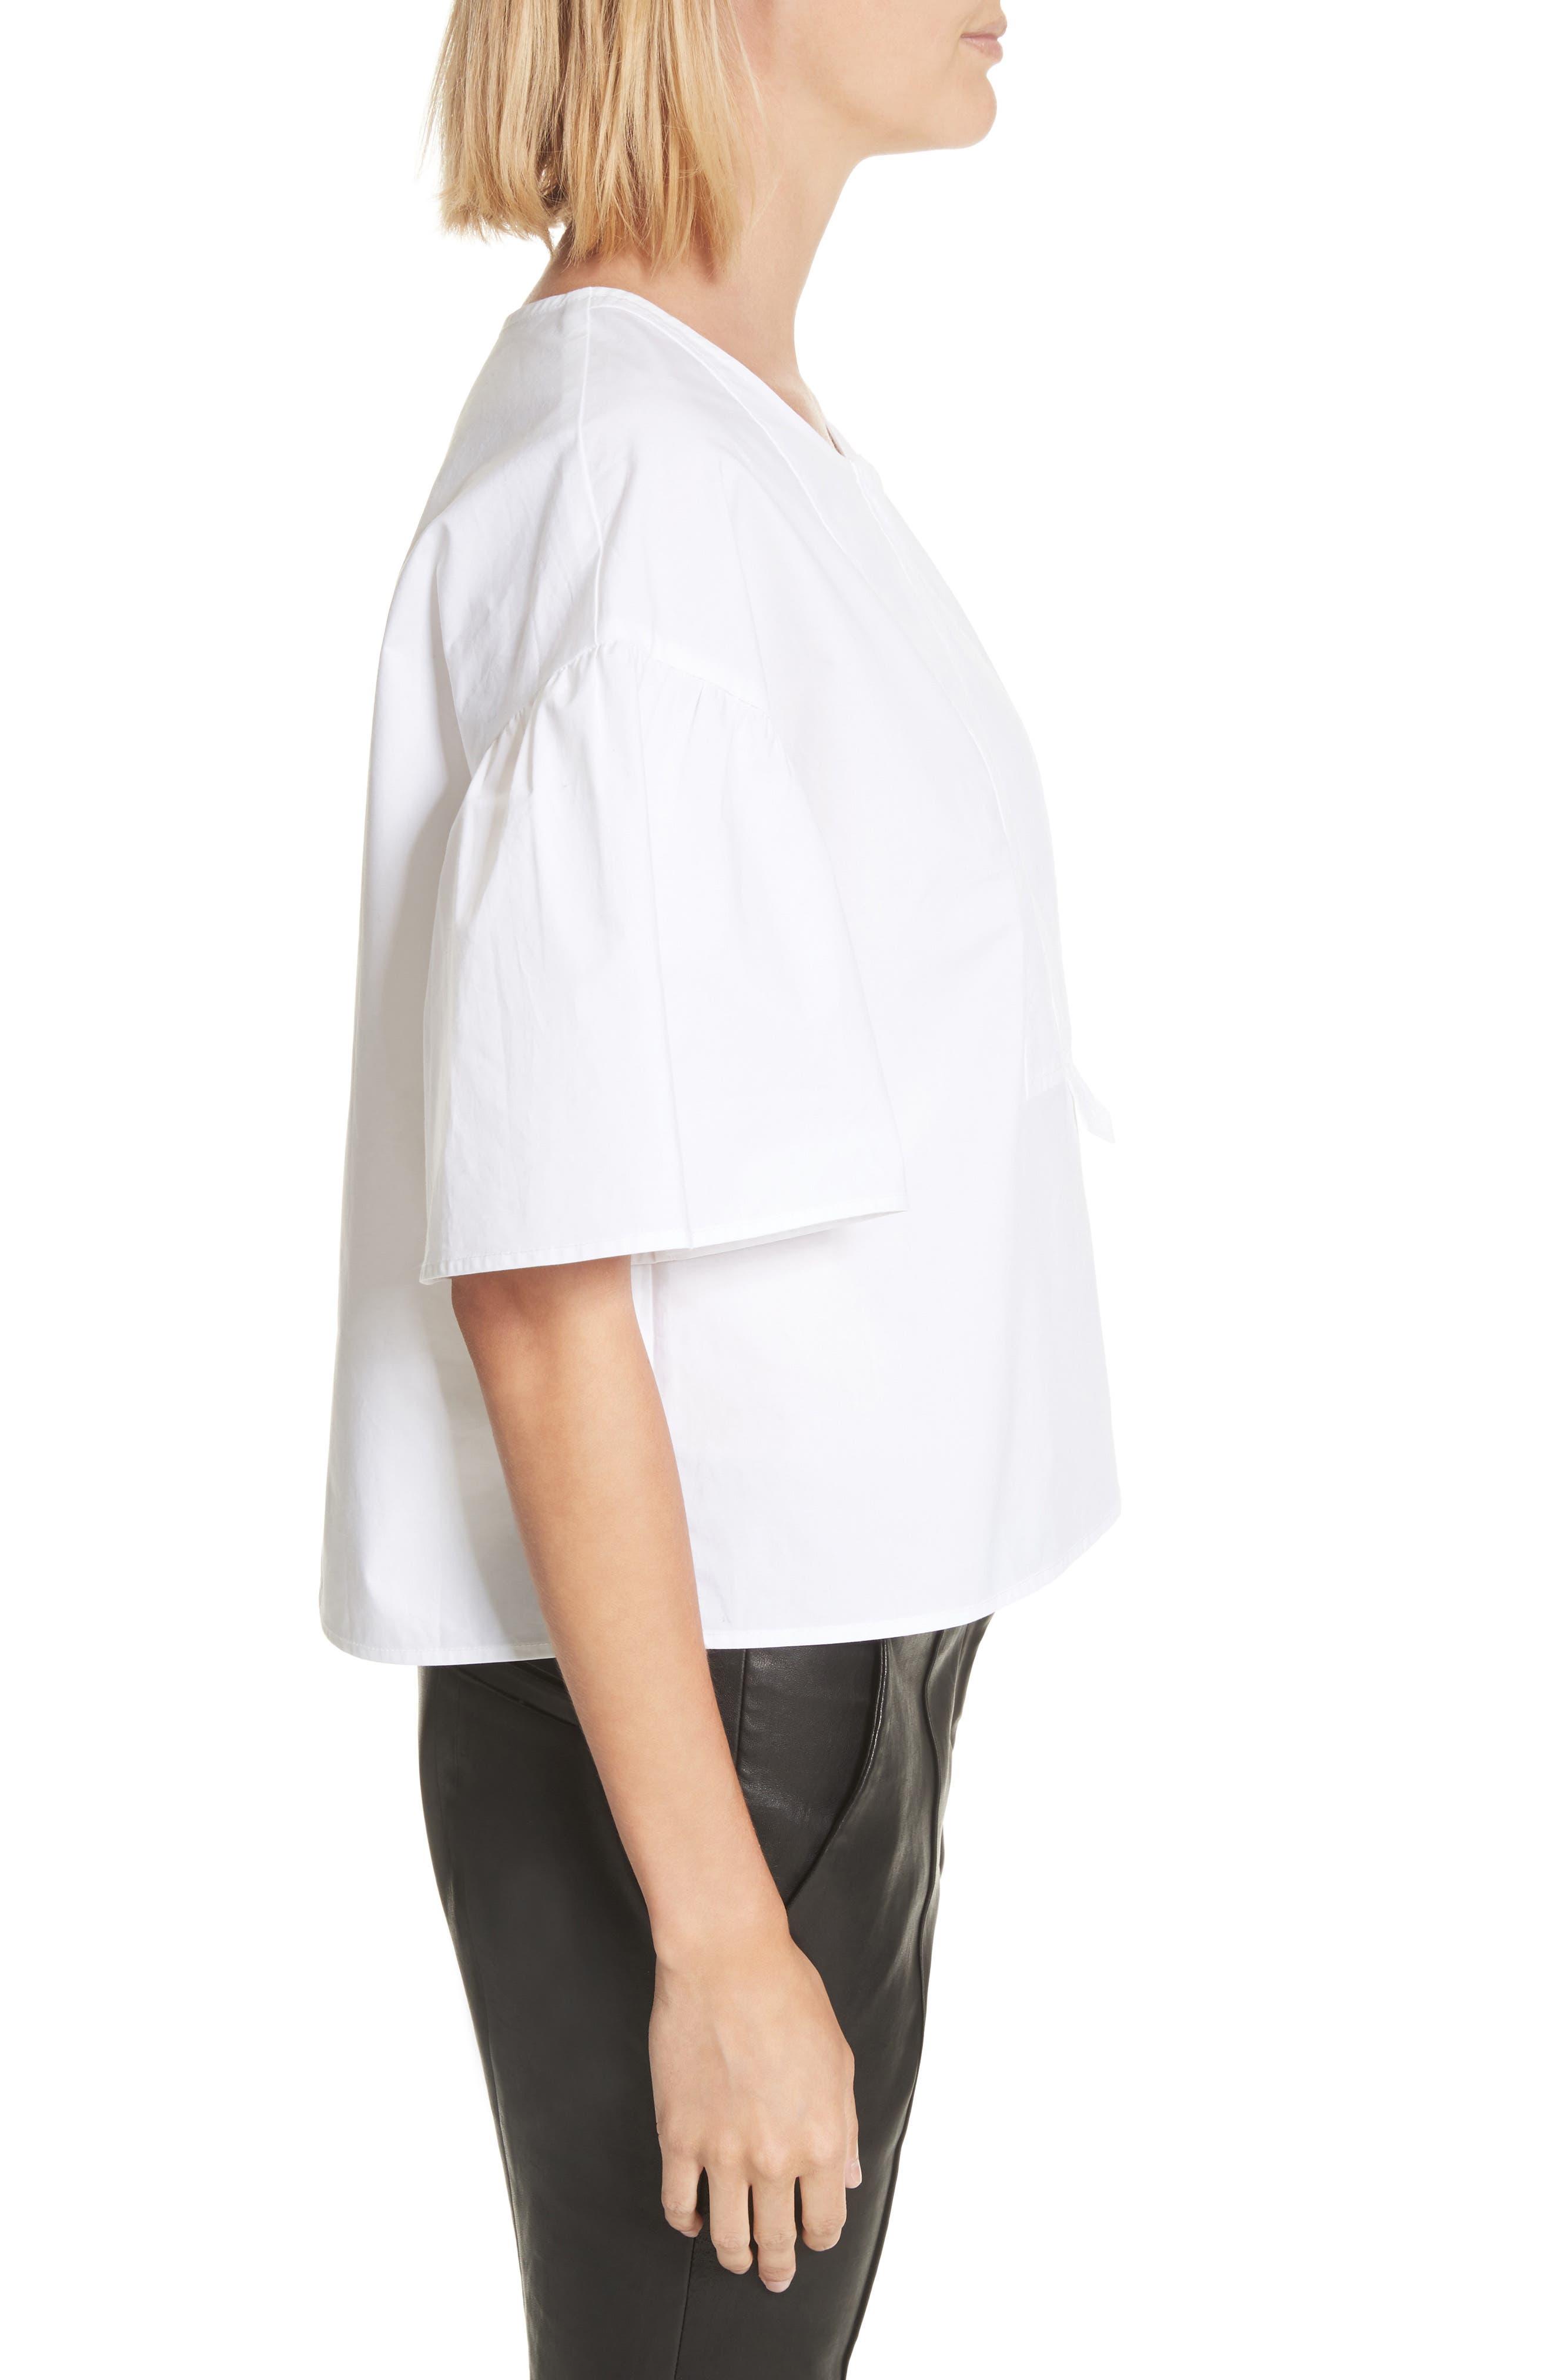 Kyrie Cotton Top,                             Alternate thumbnail 4, color,                             White